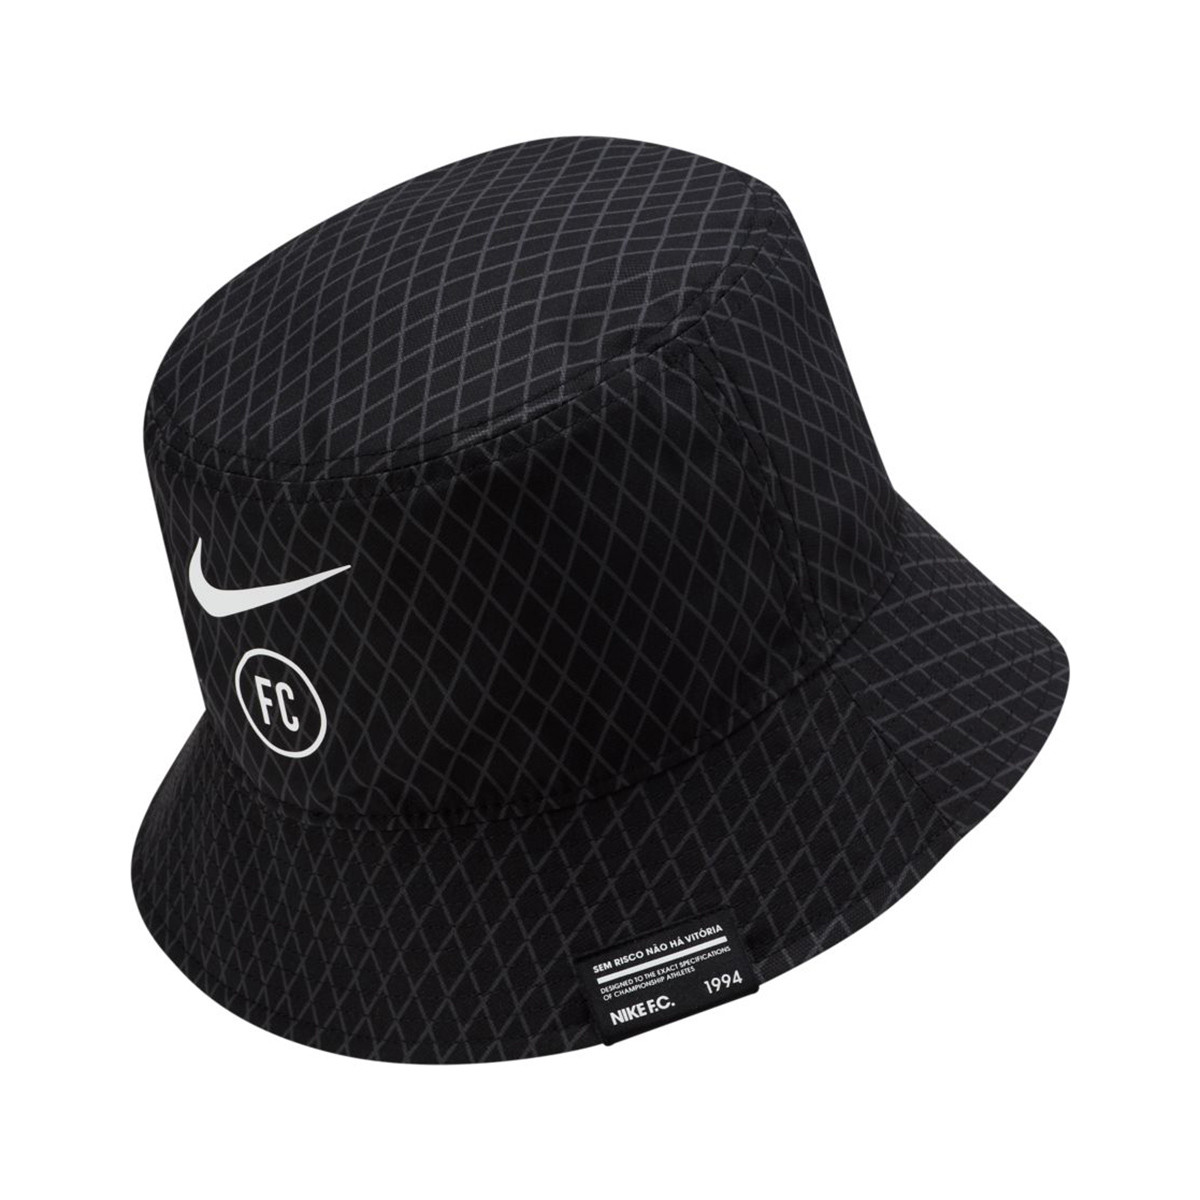 Íncubo estar impresionado Bienes  Gorro Nike NIKE F.C. Bucket Black-White - Tienda de fútbol Fútbol Emotion